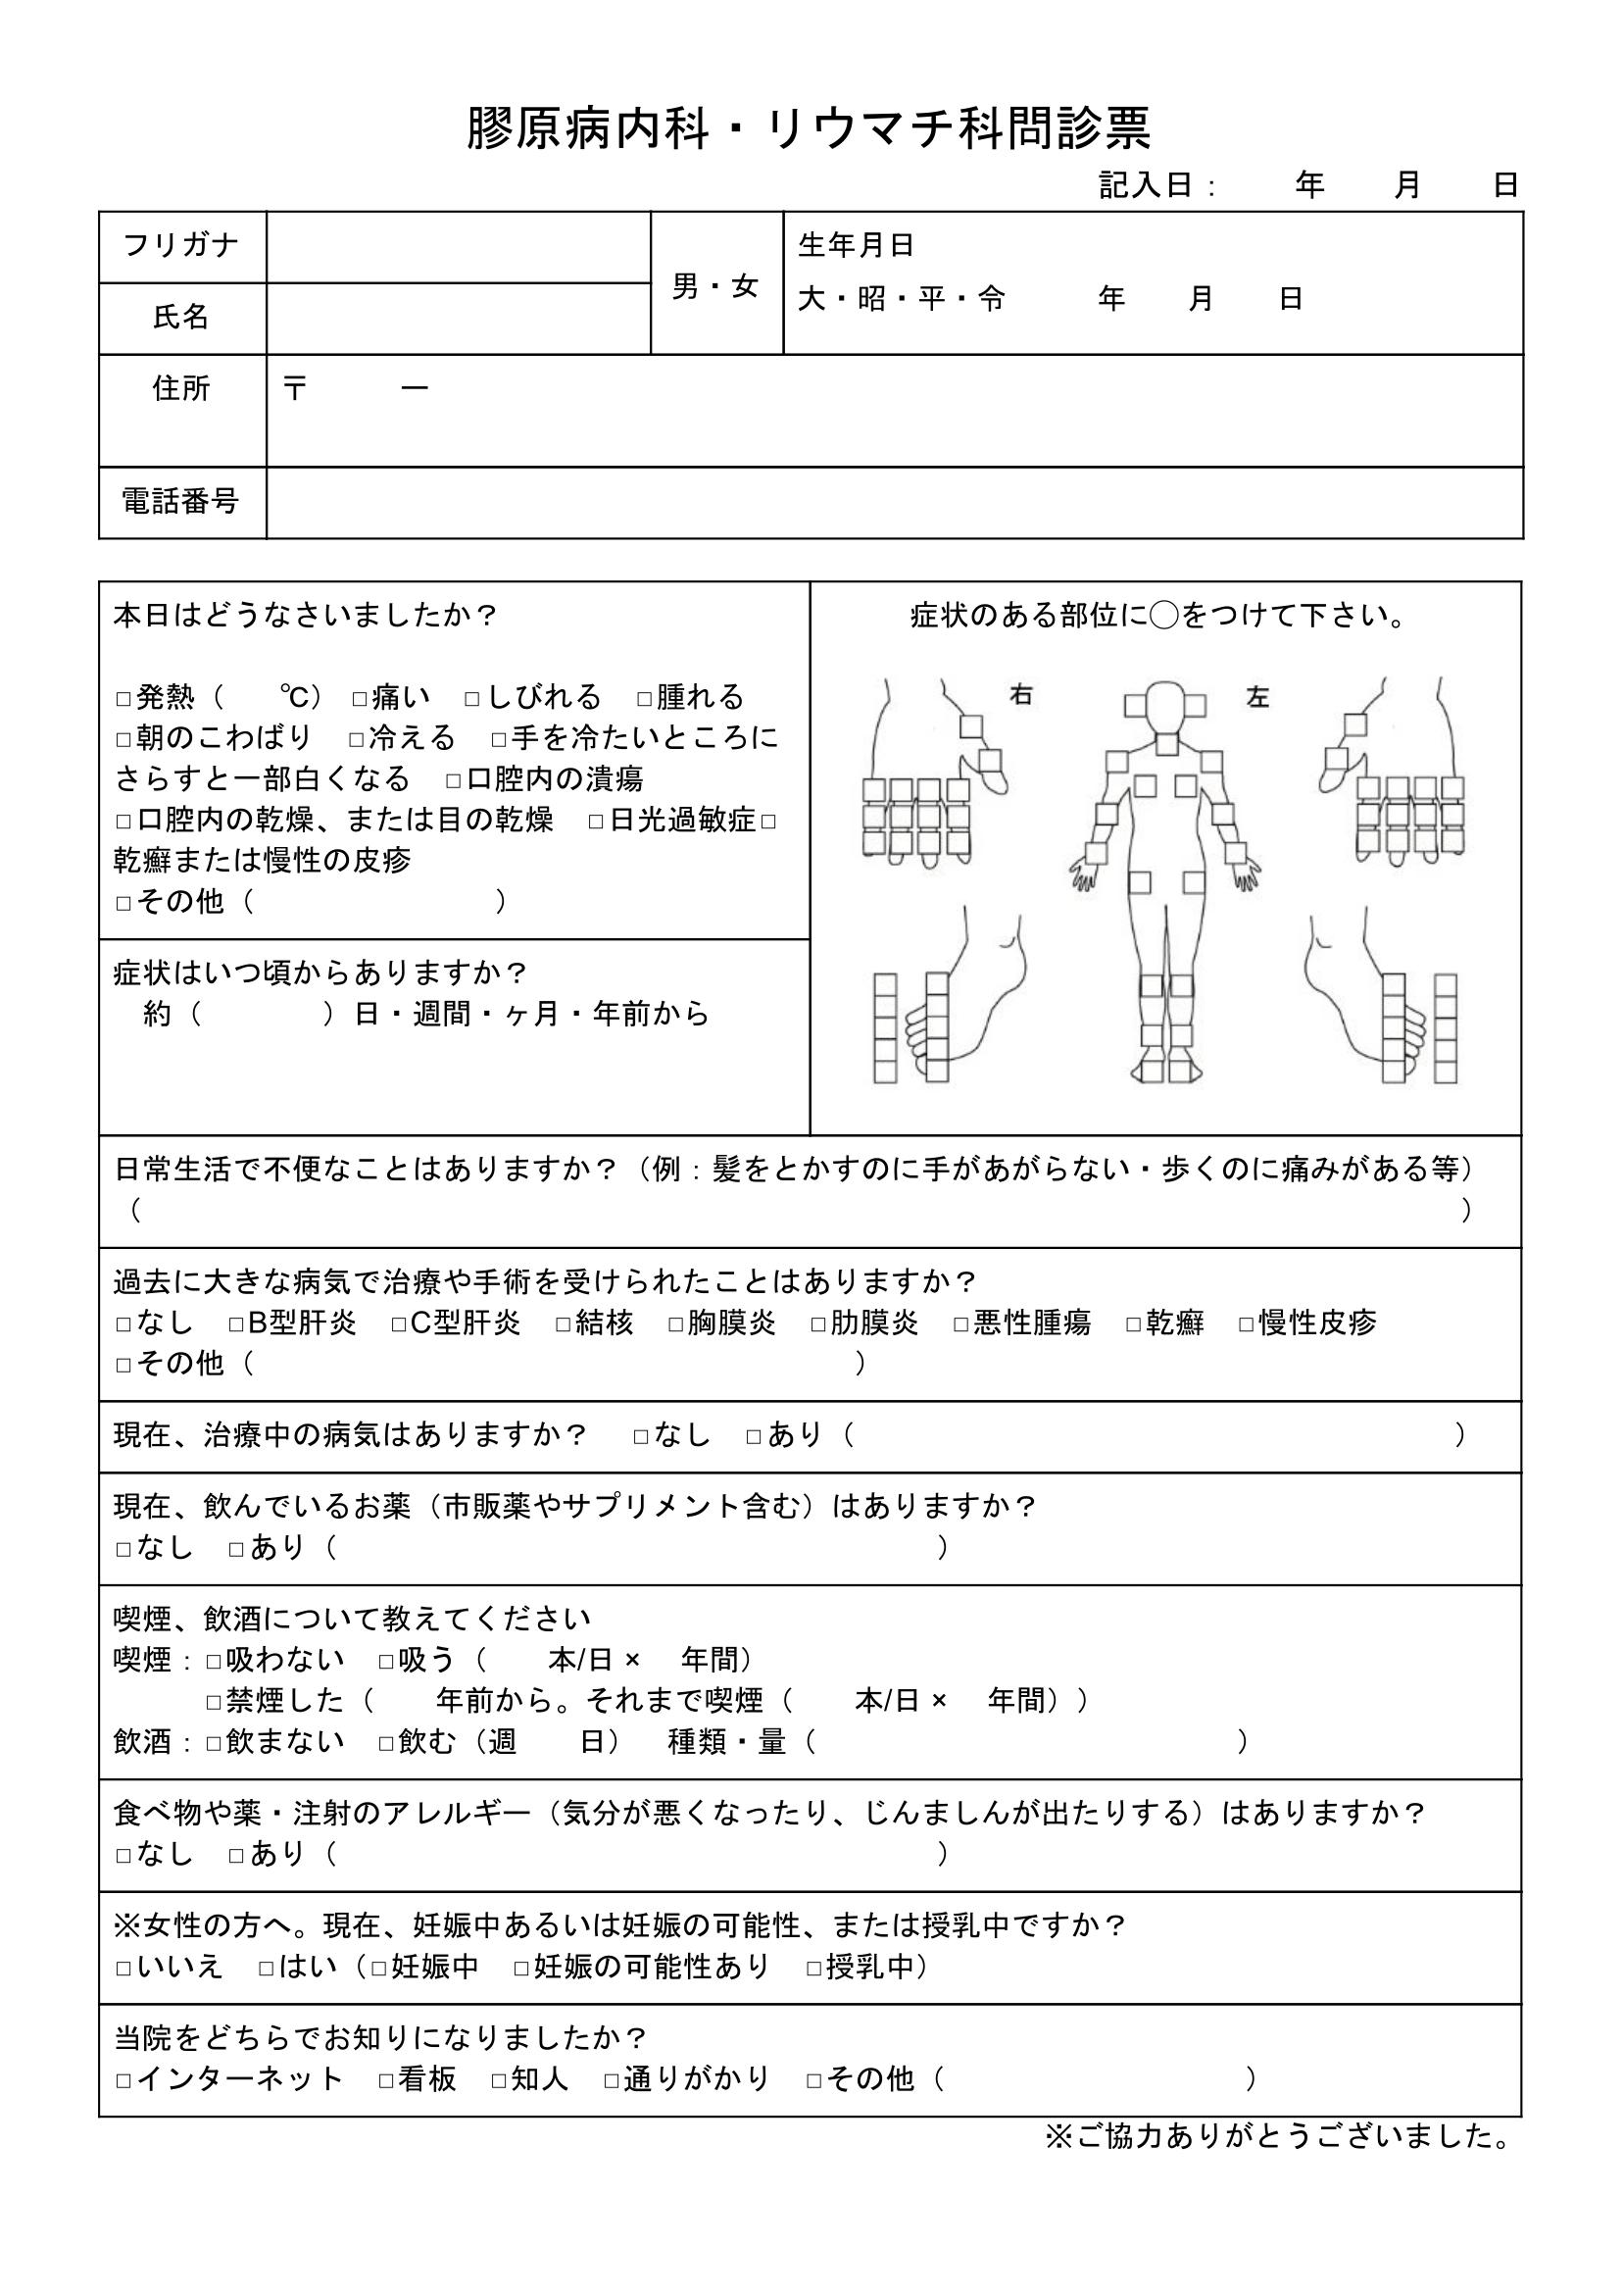 rheumatology-monshin-sample